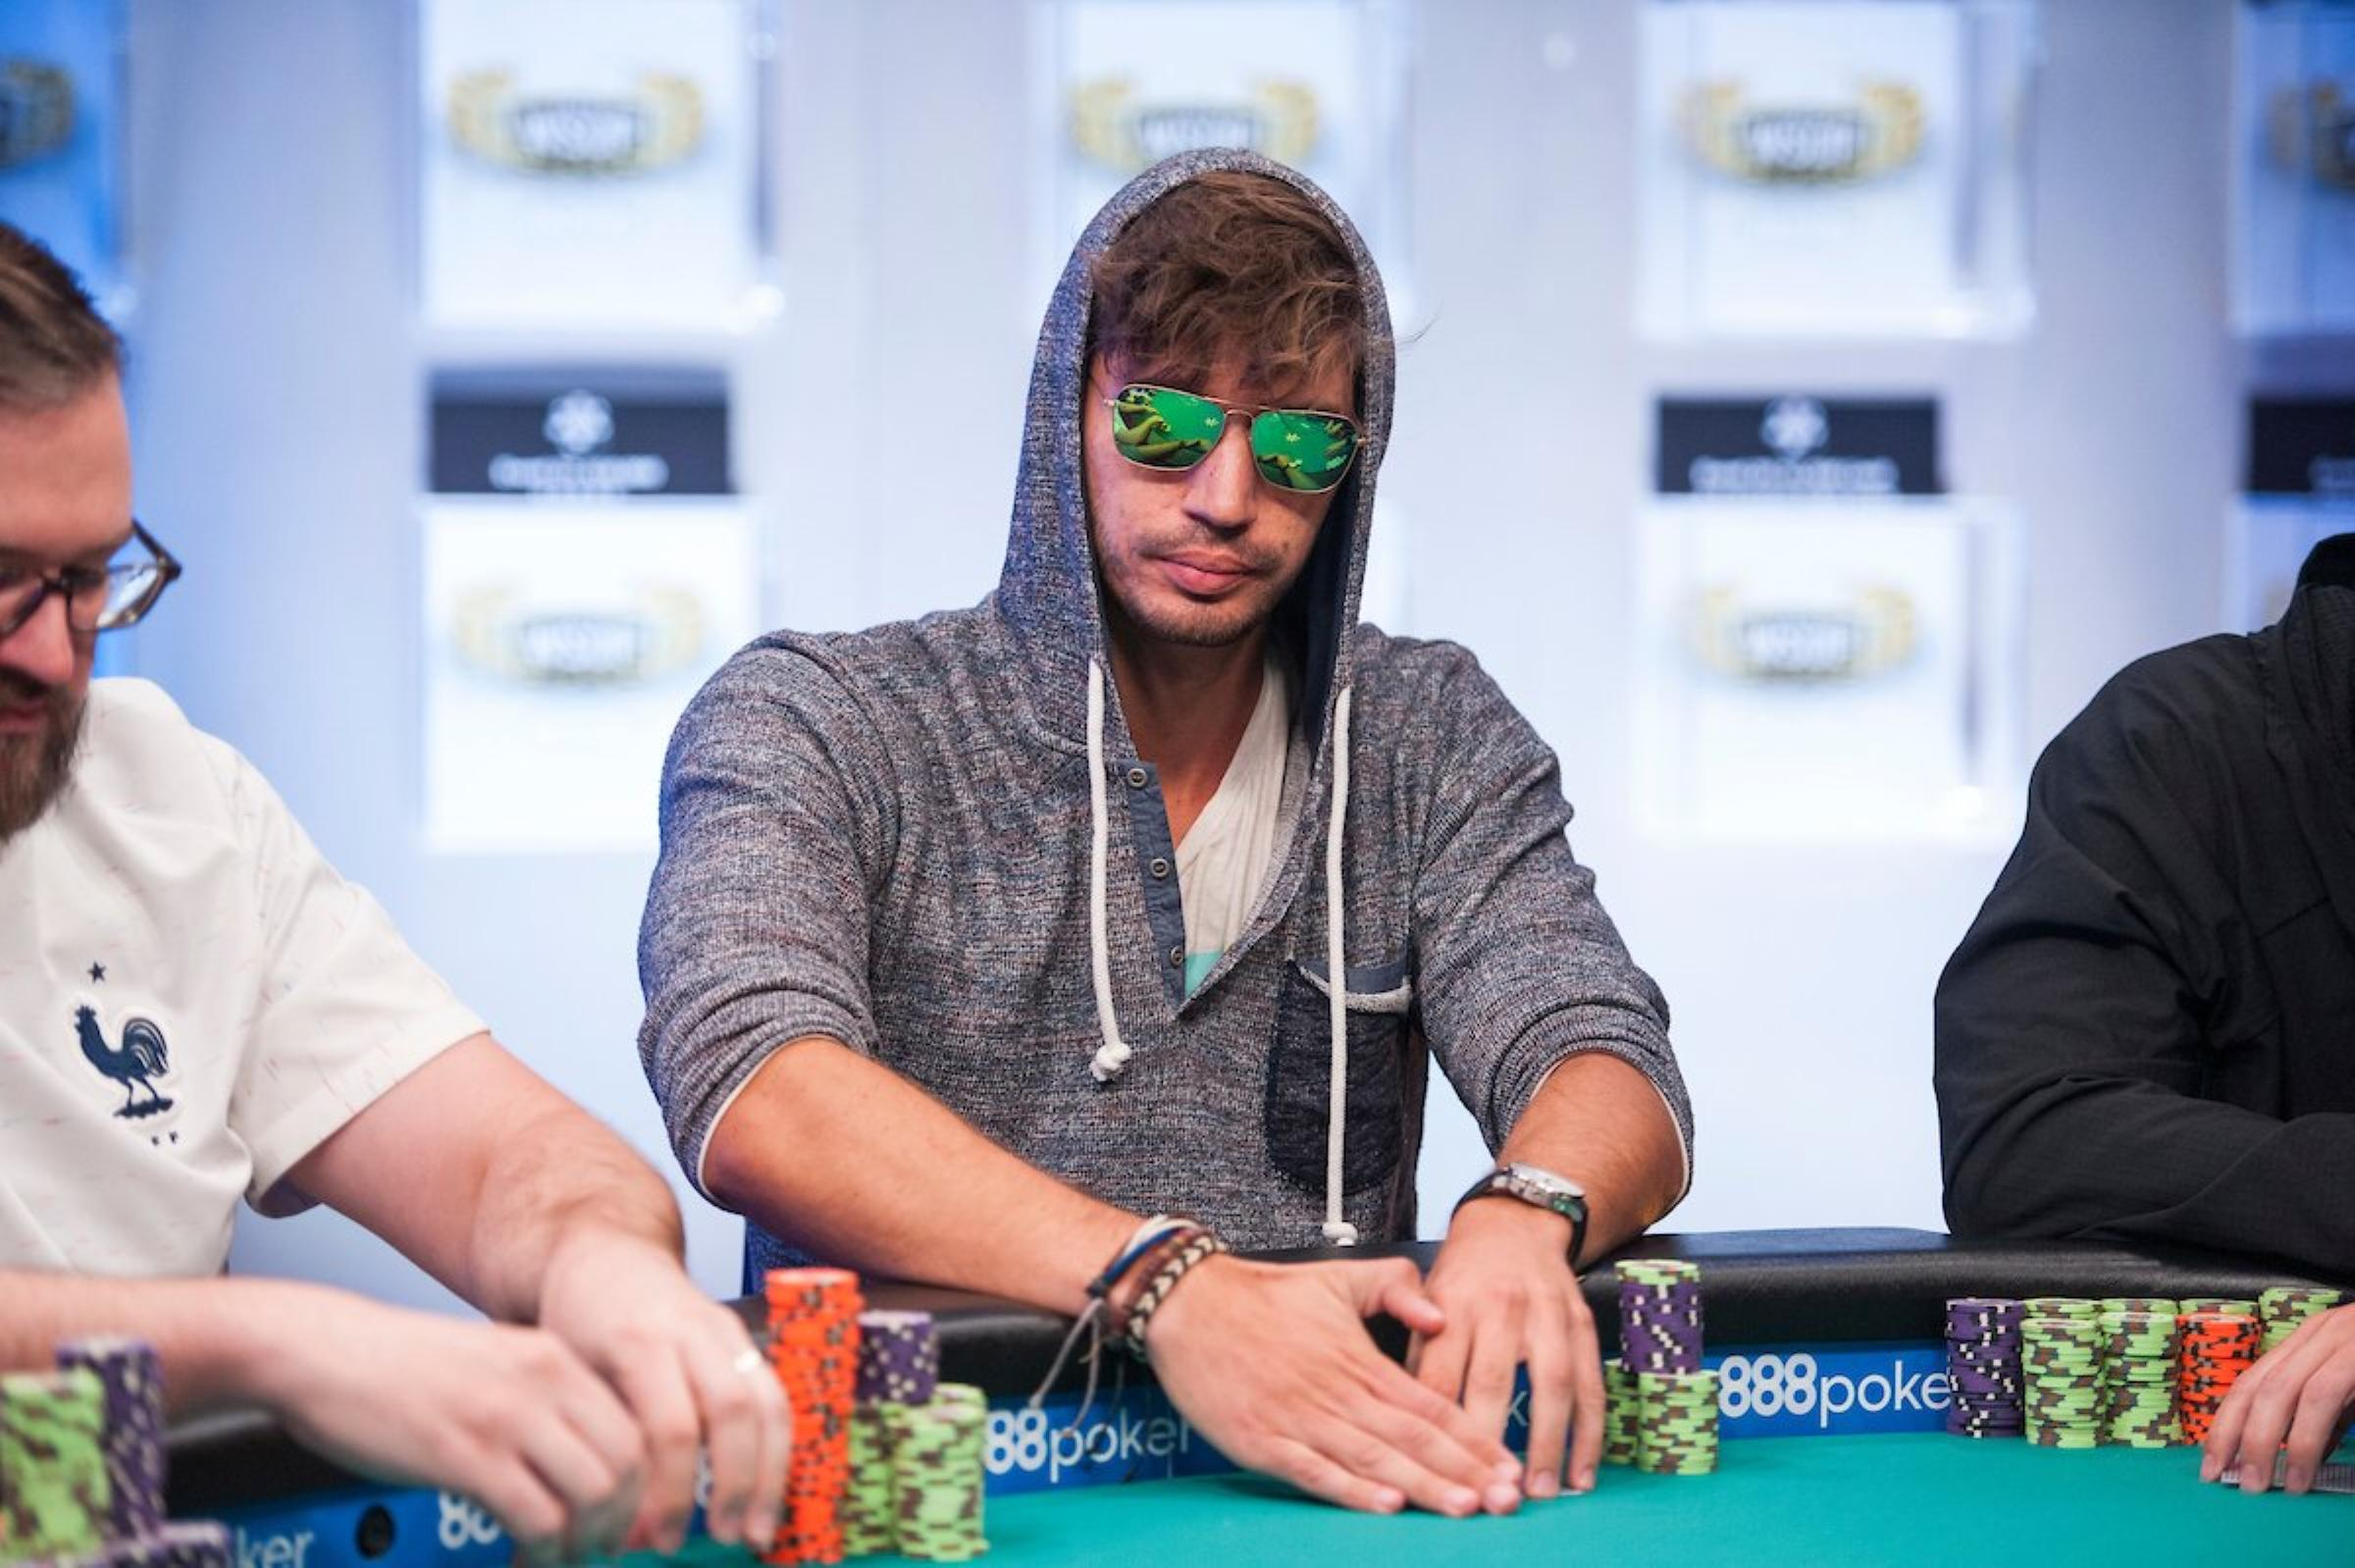 Pokerspieler Arne Kern im Turnier